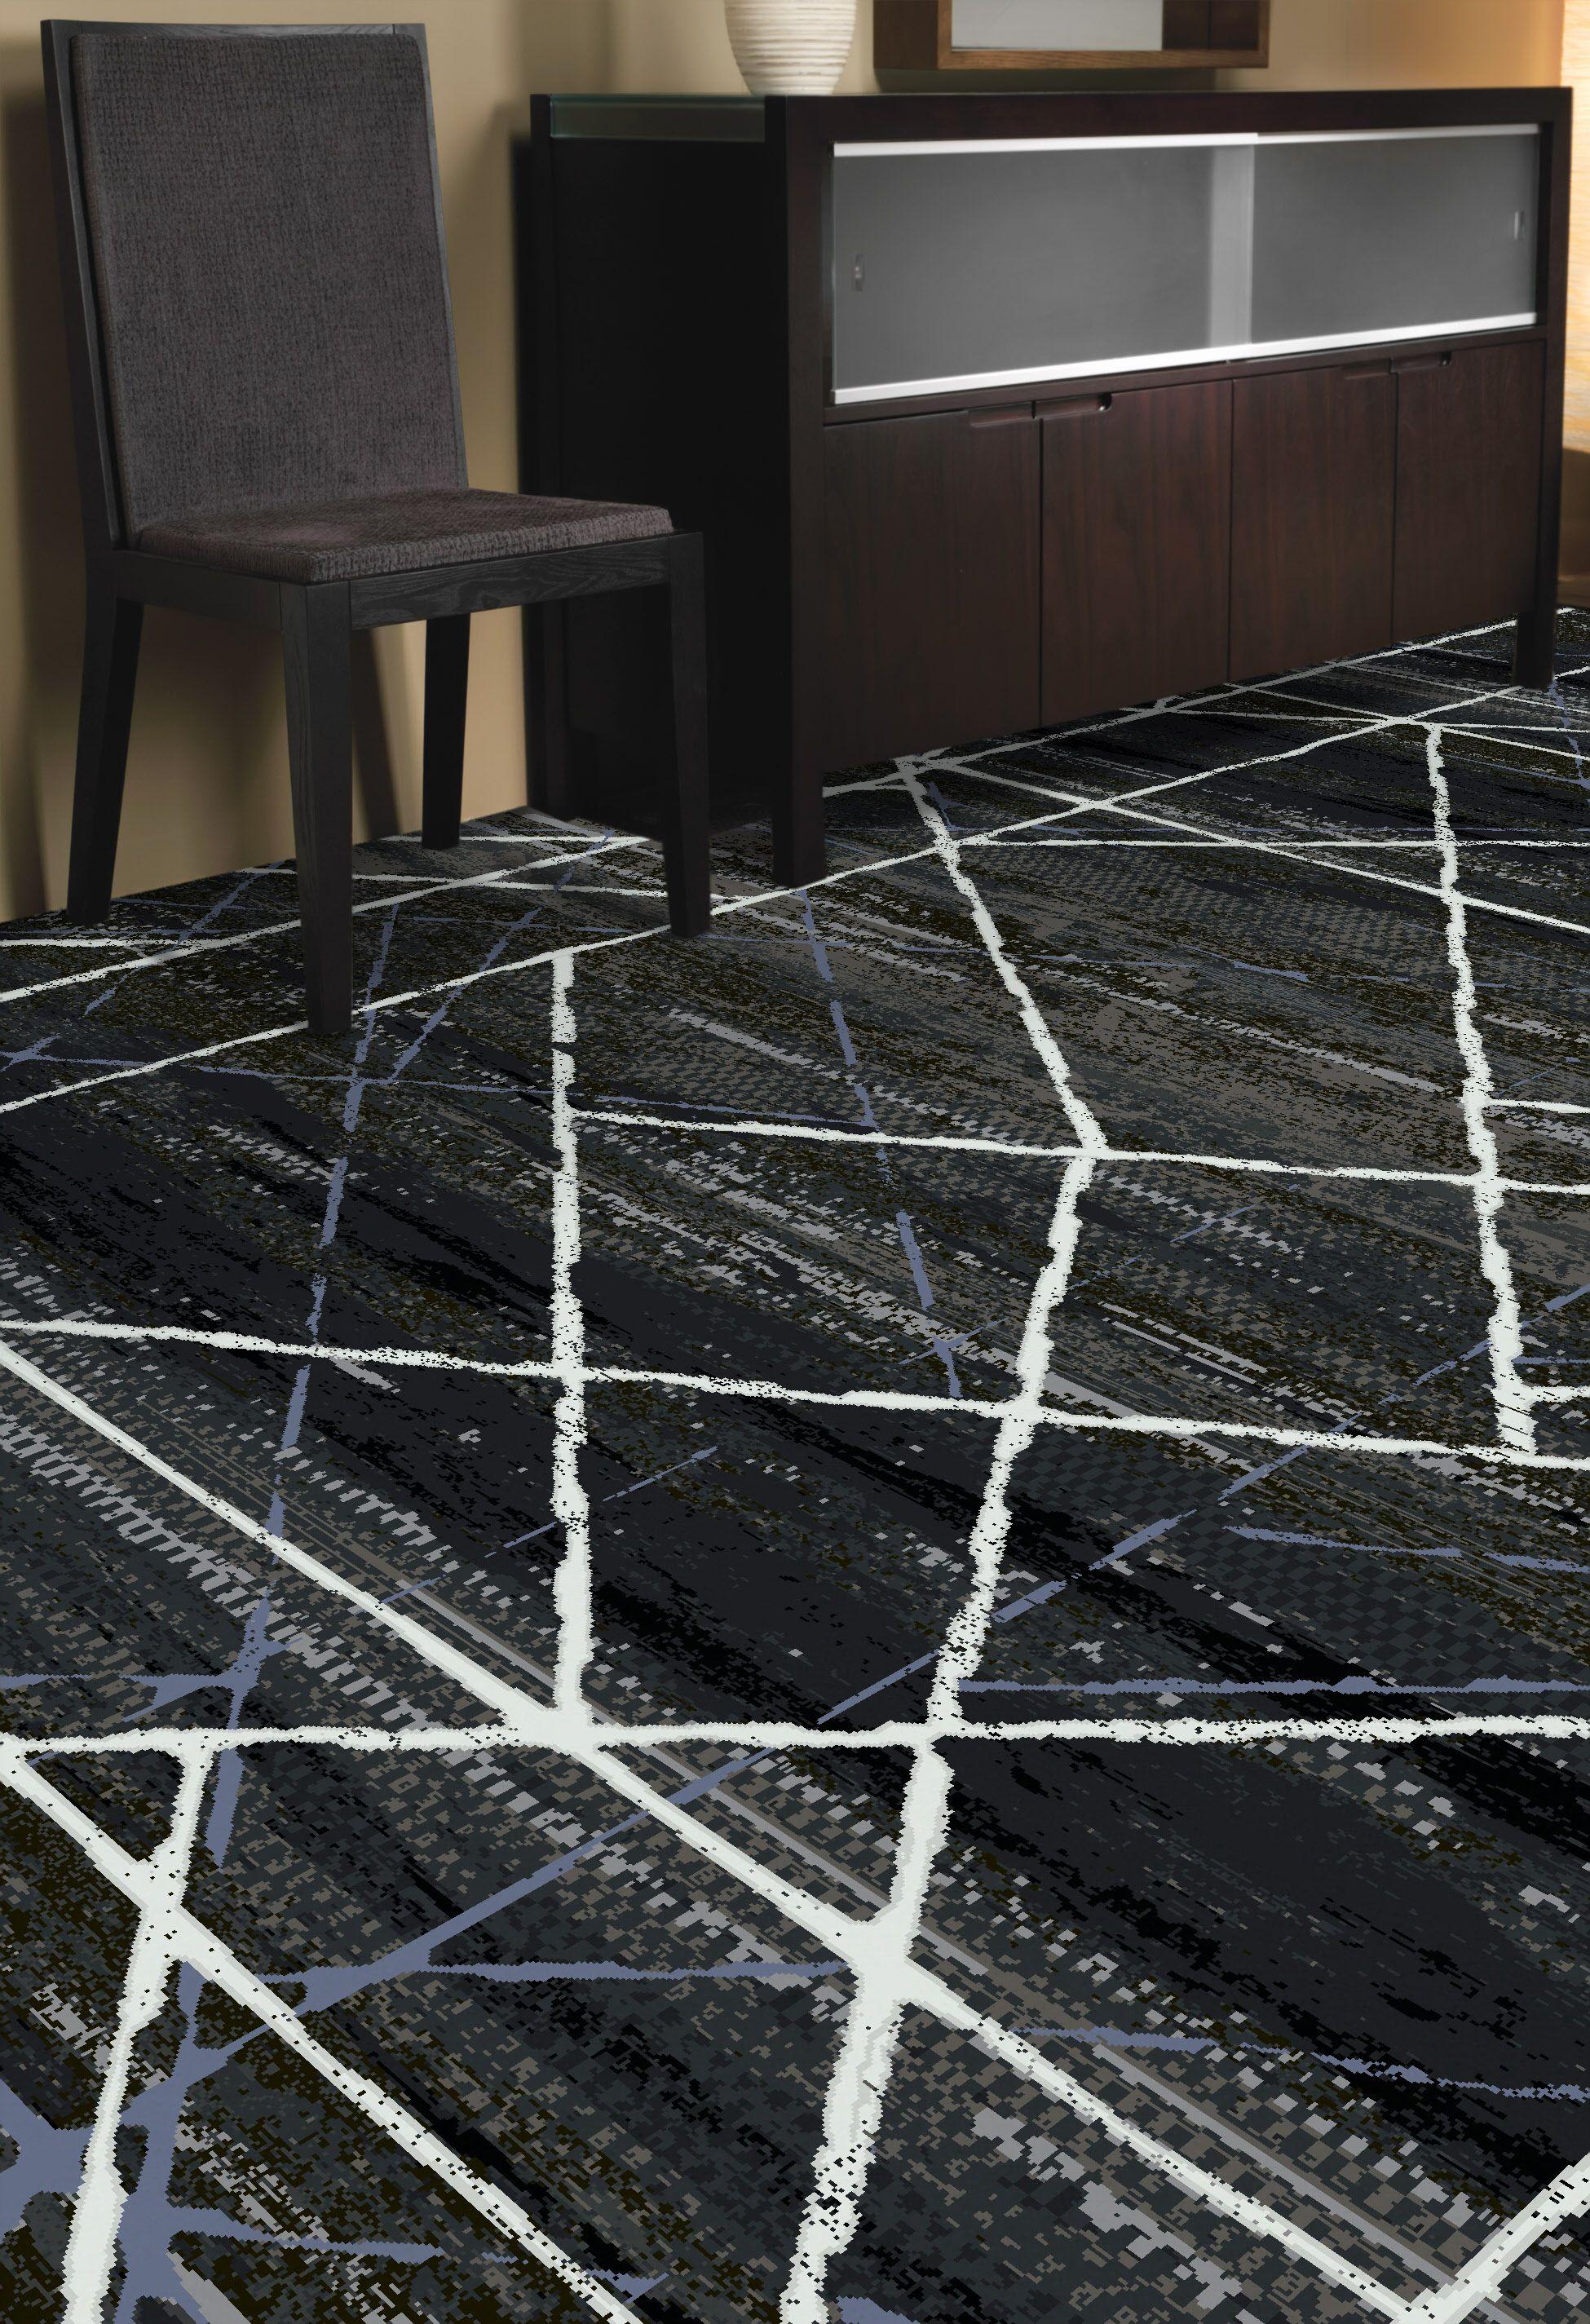 Qtw49542 Durkan Hospitalitydesign Products Carpet Hotel